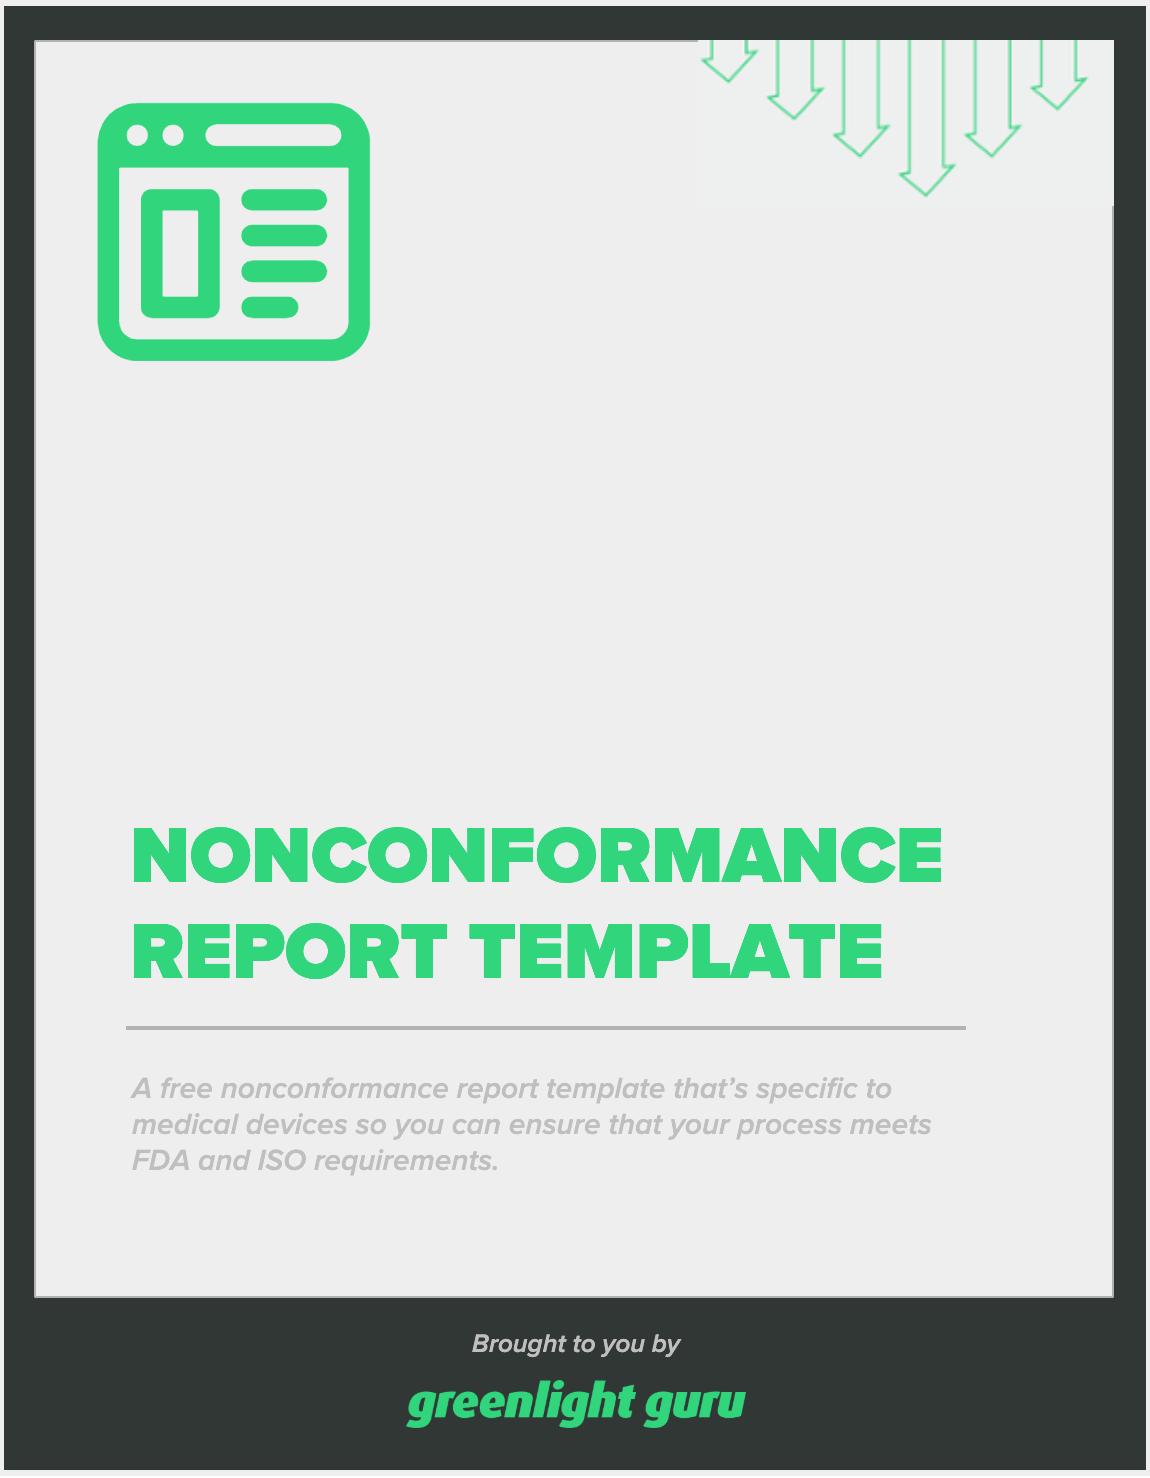 Nonconformance report template - slide-in cover